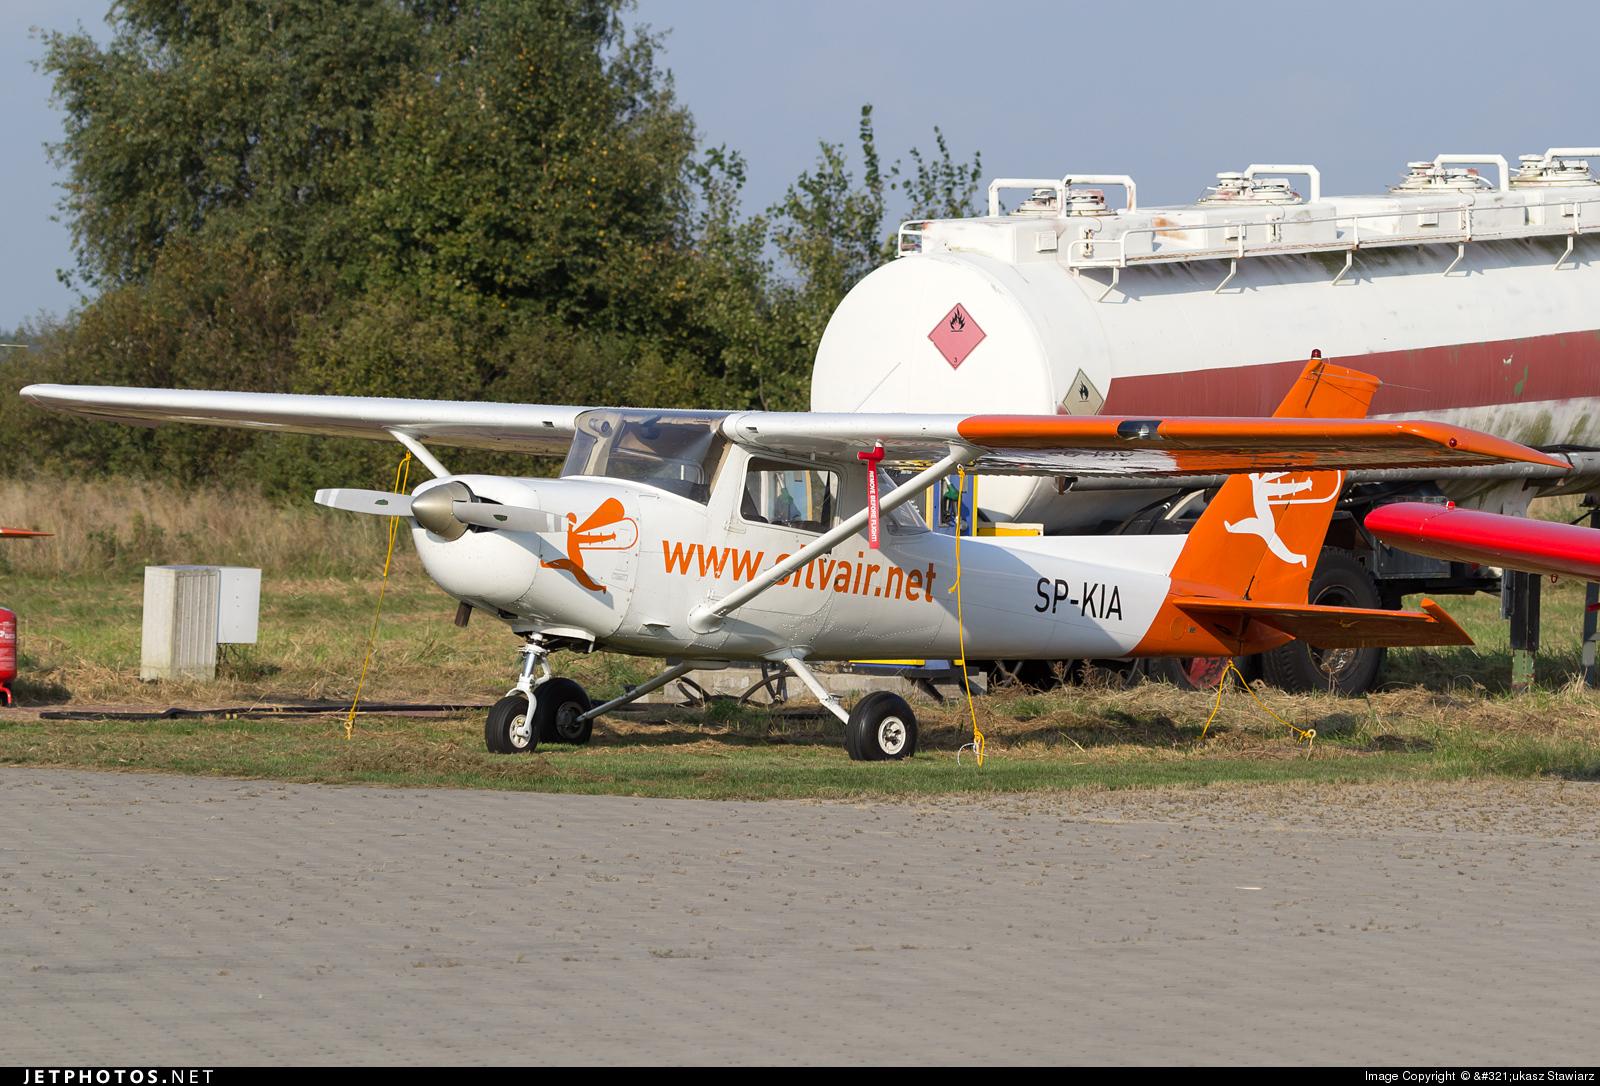 SP-KIA - Reims-Cessna F152 II - Silvair